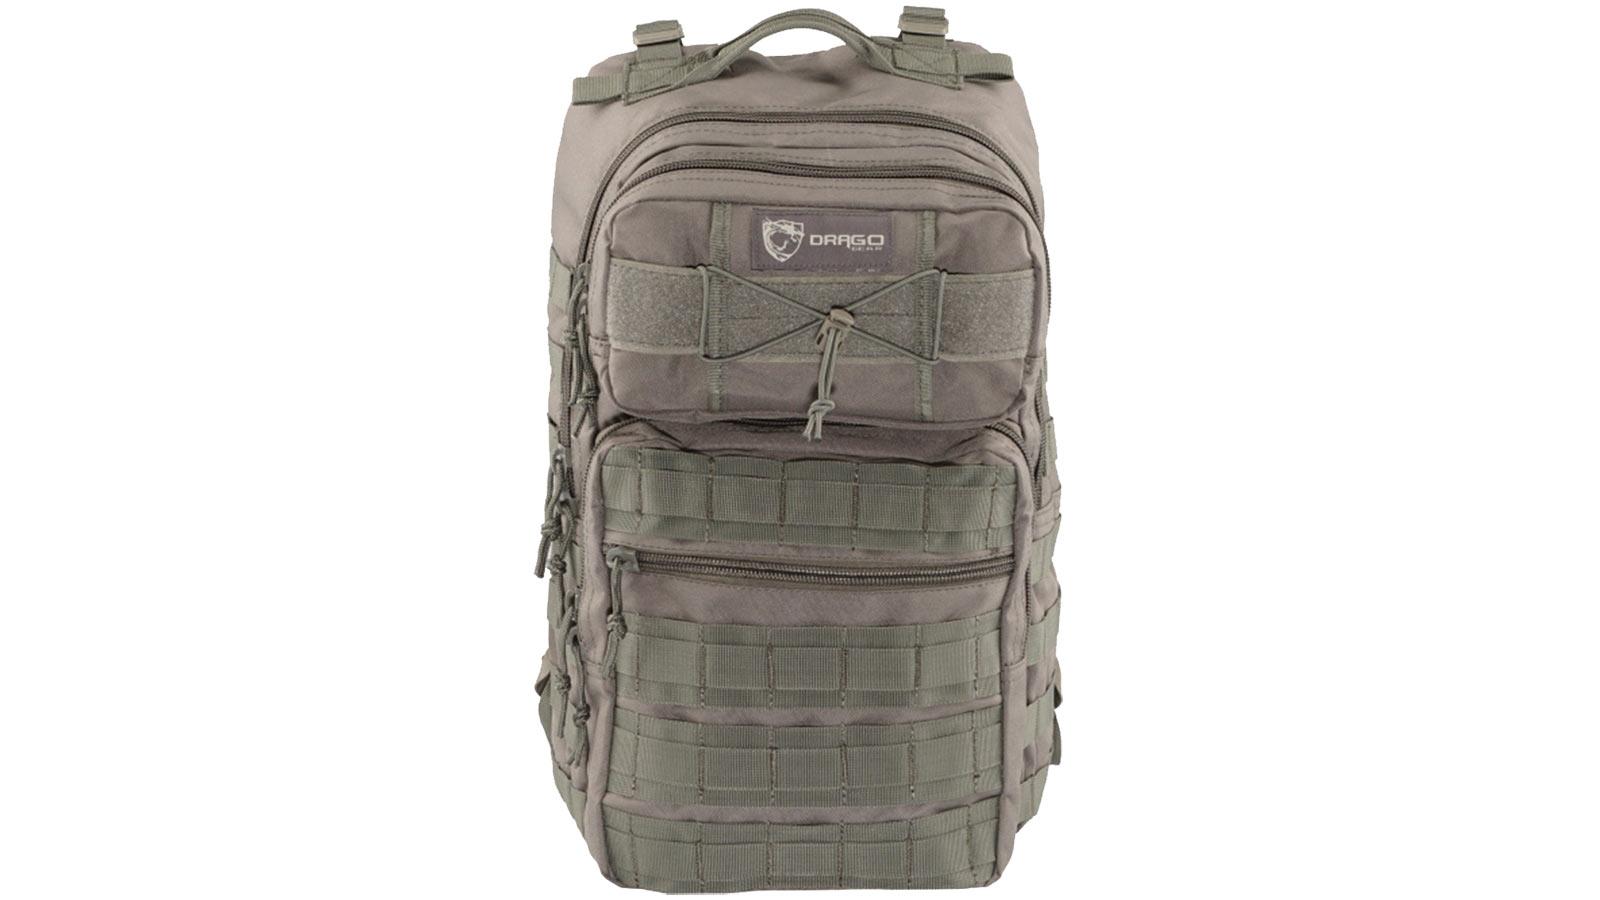 Drago Ranger Laptop Backpack Seal Gray